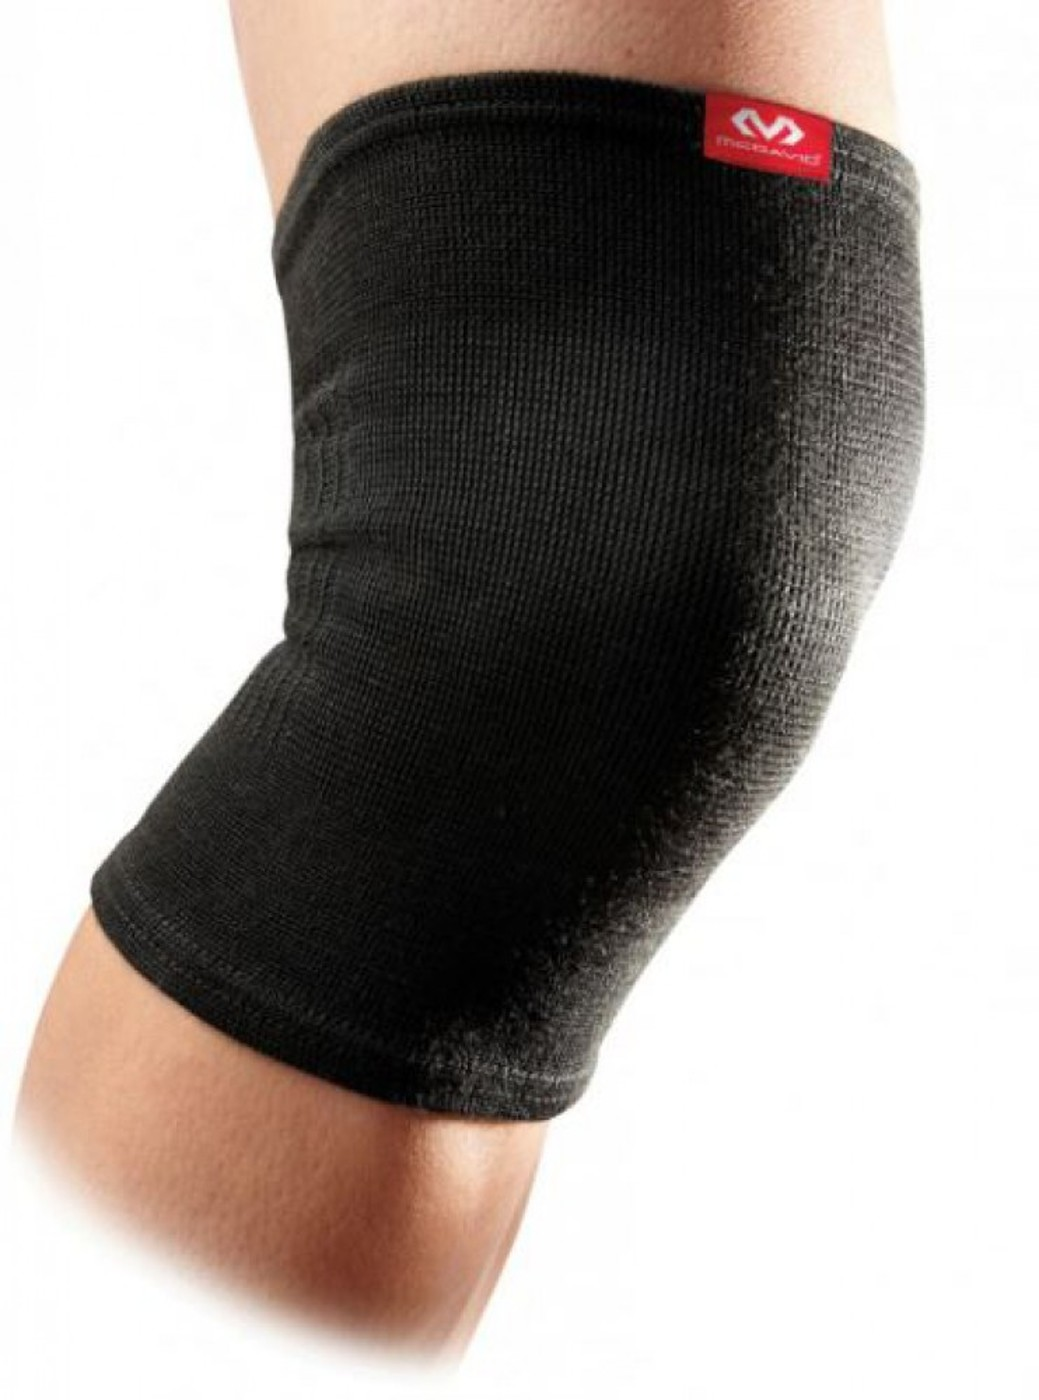 MC DAVID Elastische Kniebandage